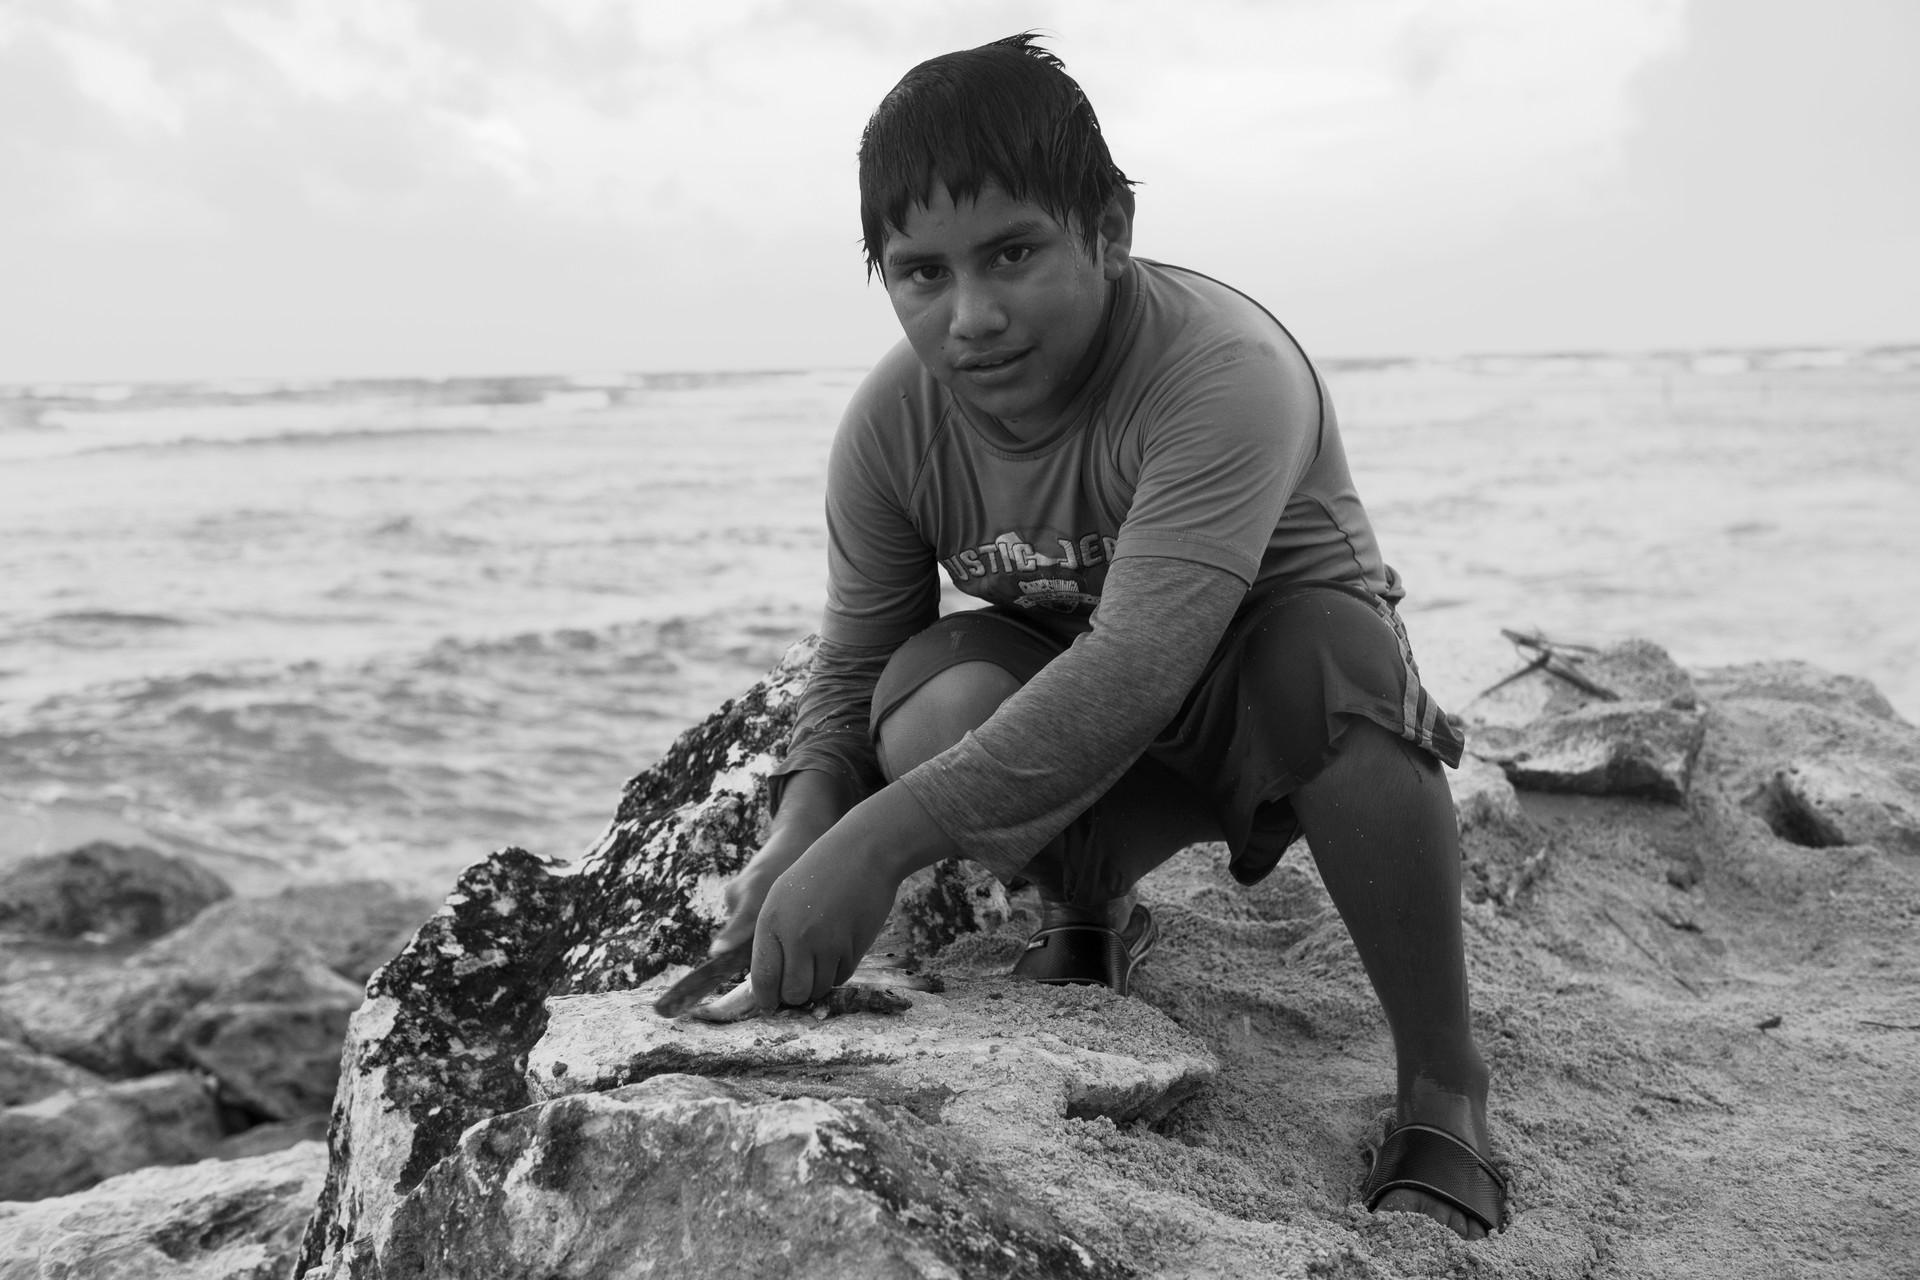 vuong vu photography, seattle, fishing village, Mexico, lifestyle photographer